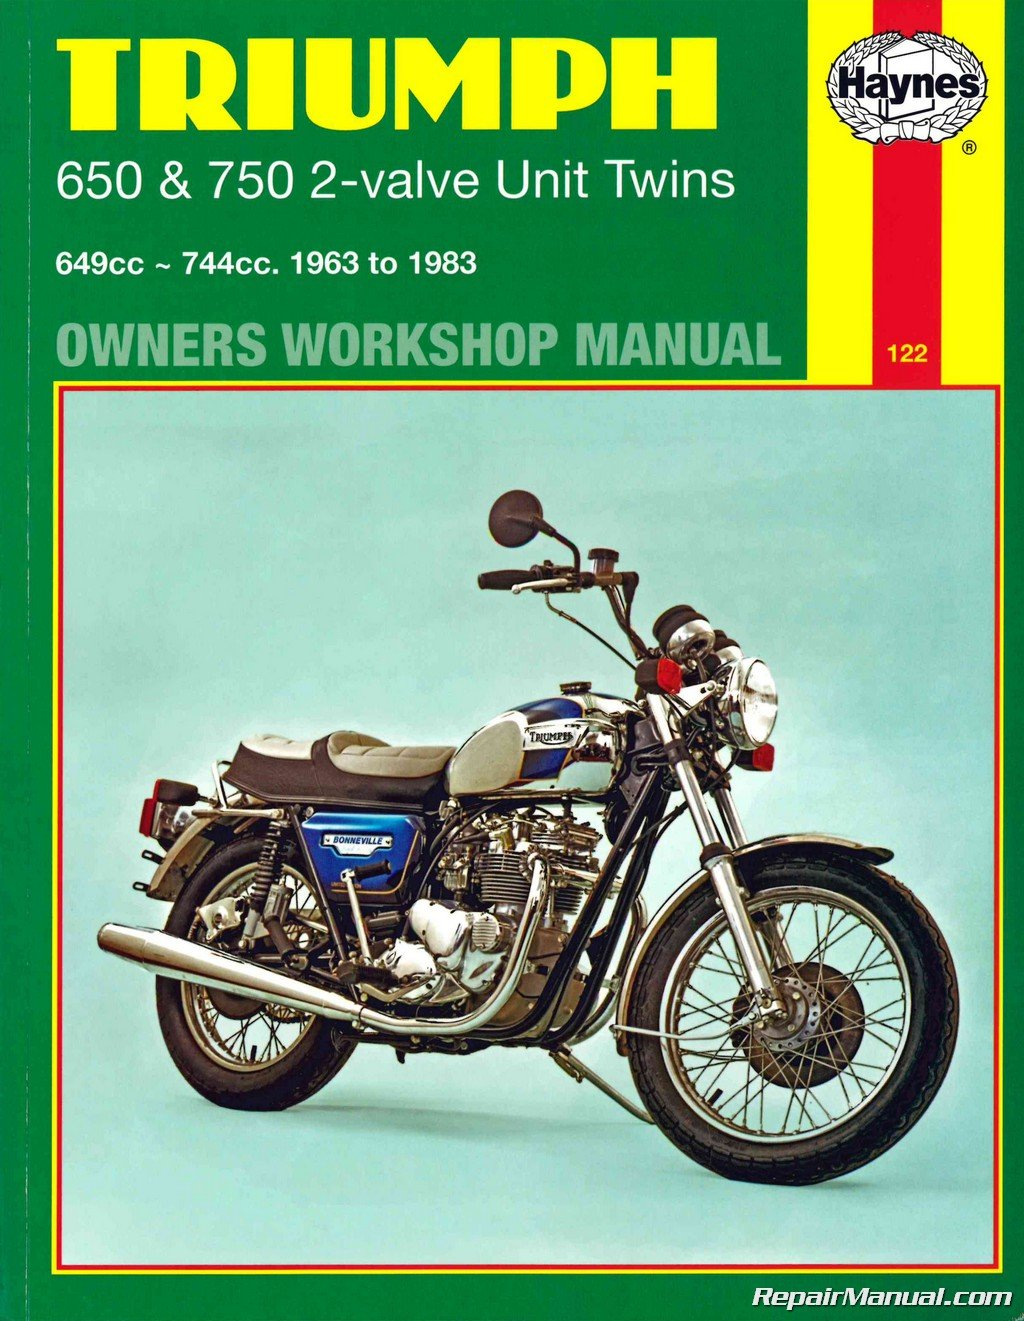 Vo 9730 1969 Triumph Bonneville Wiring Diagram Download Diagram